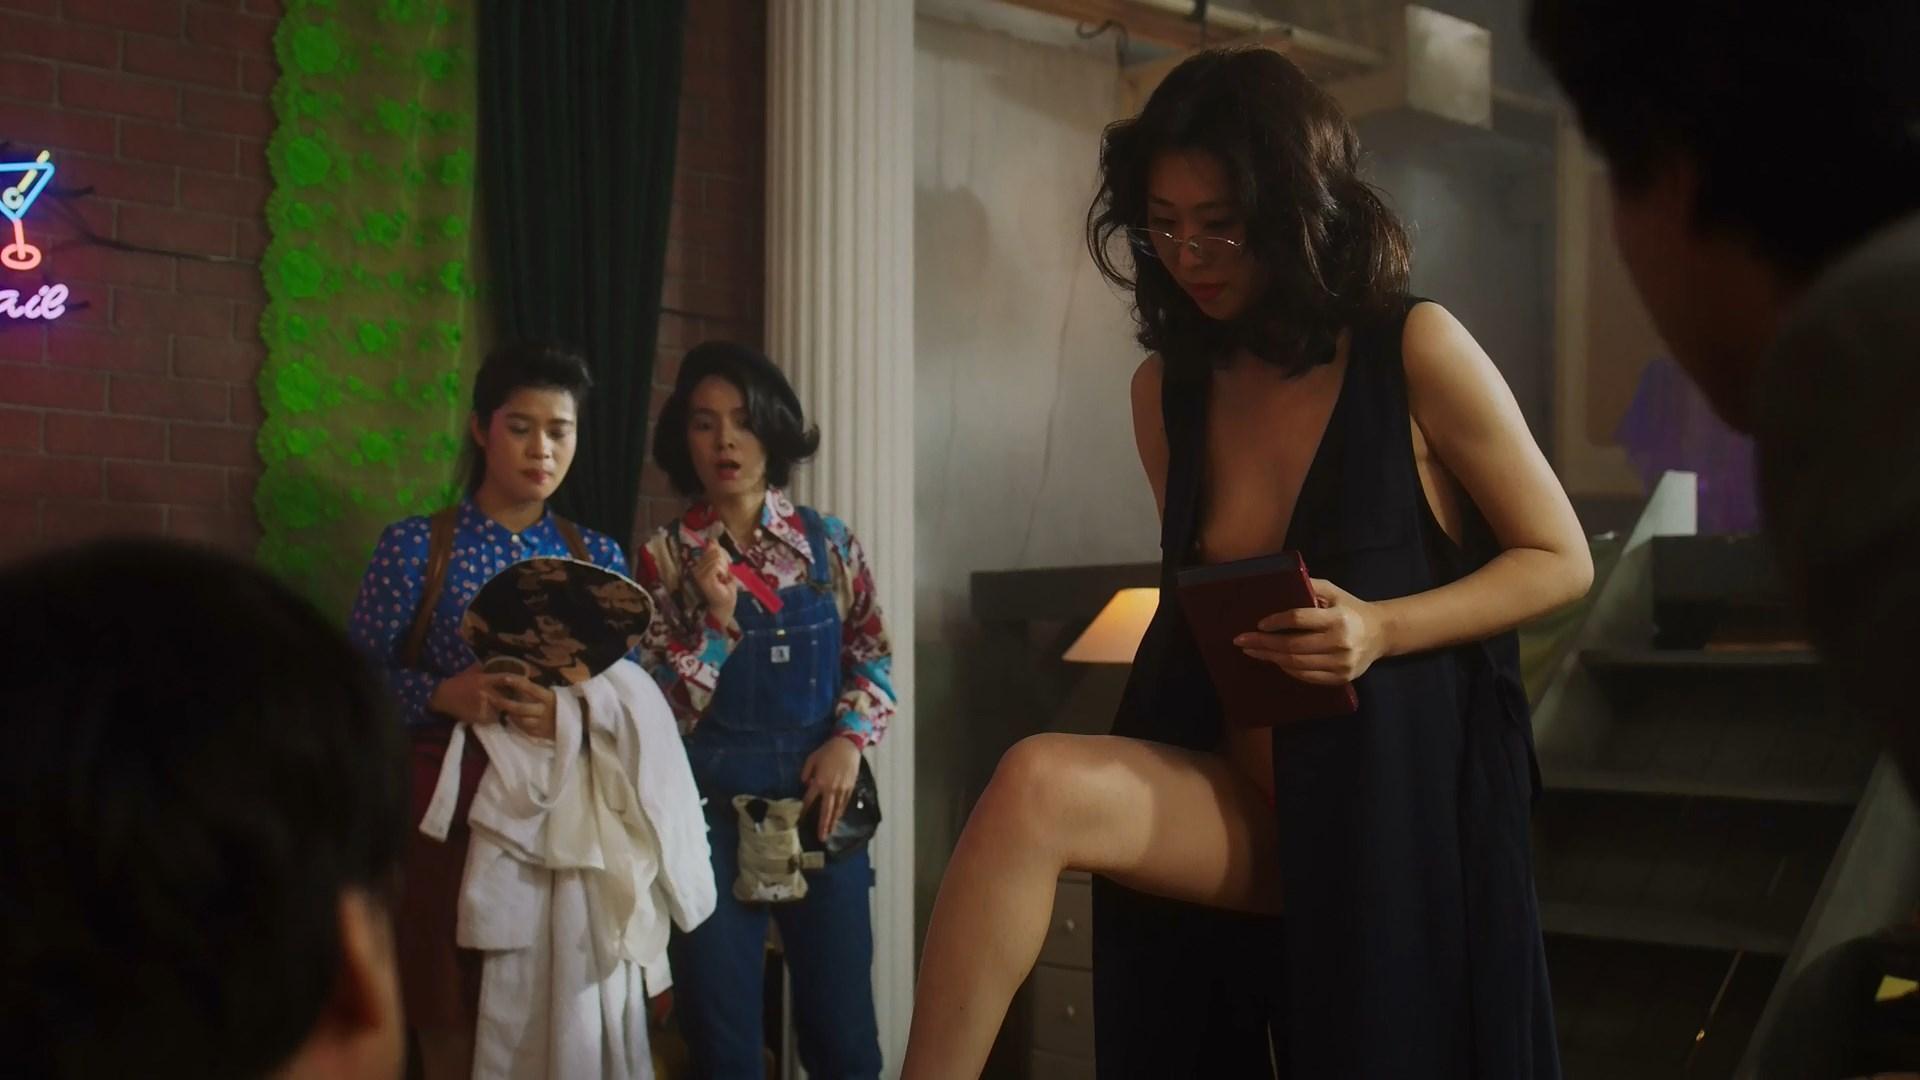 Angela Covello Nude watch online - misato morita, etc - the naked director